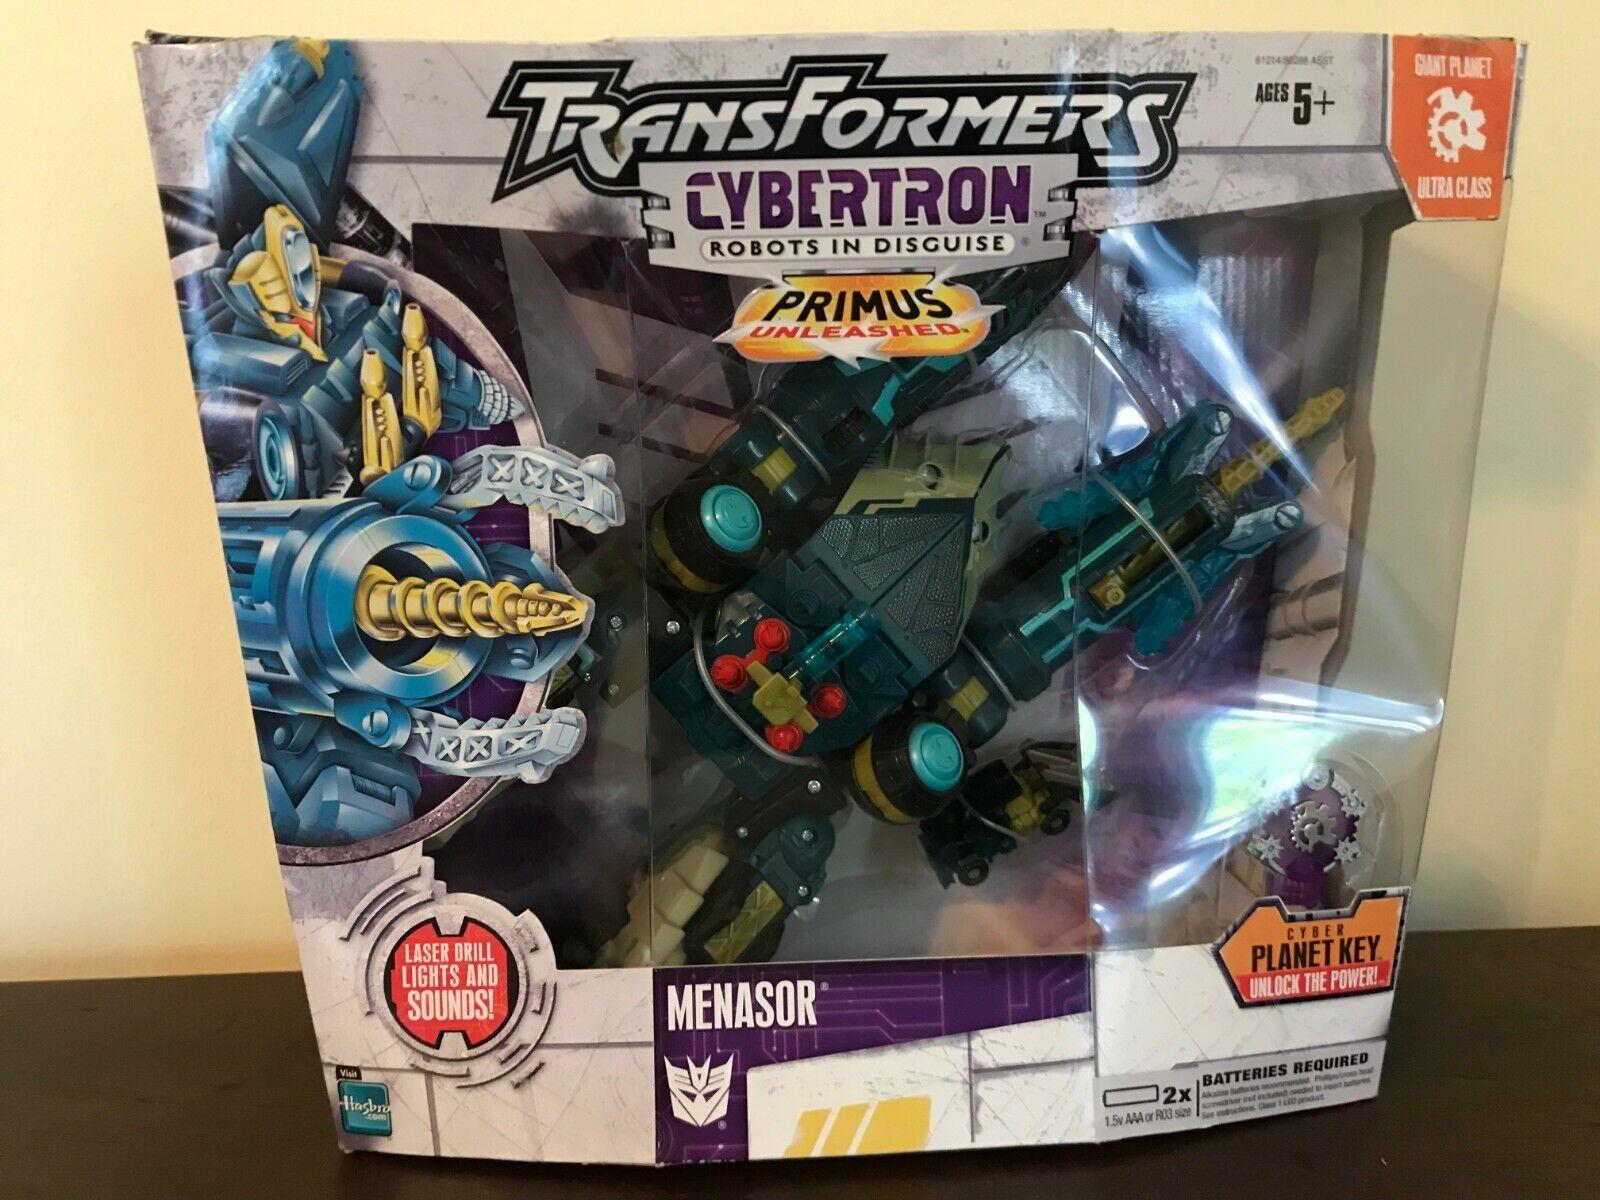 2005 Hasbro Transformers Cybertron Ultra MENASOR with Heavy Load